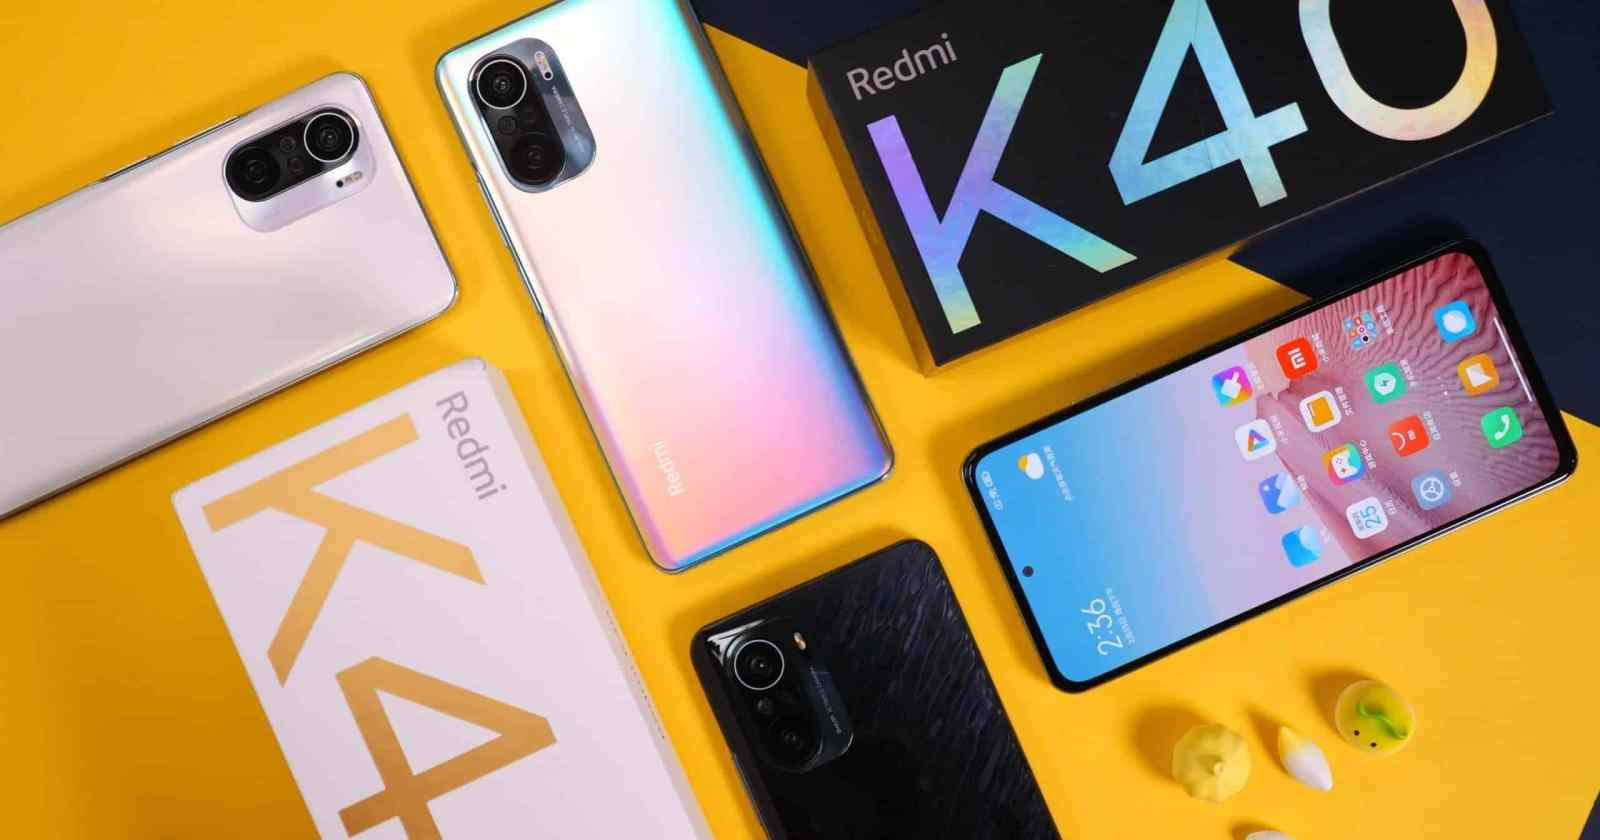 Redmi K40 5G Specifications, Redmi K40 5G price in india